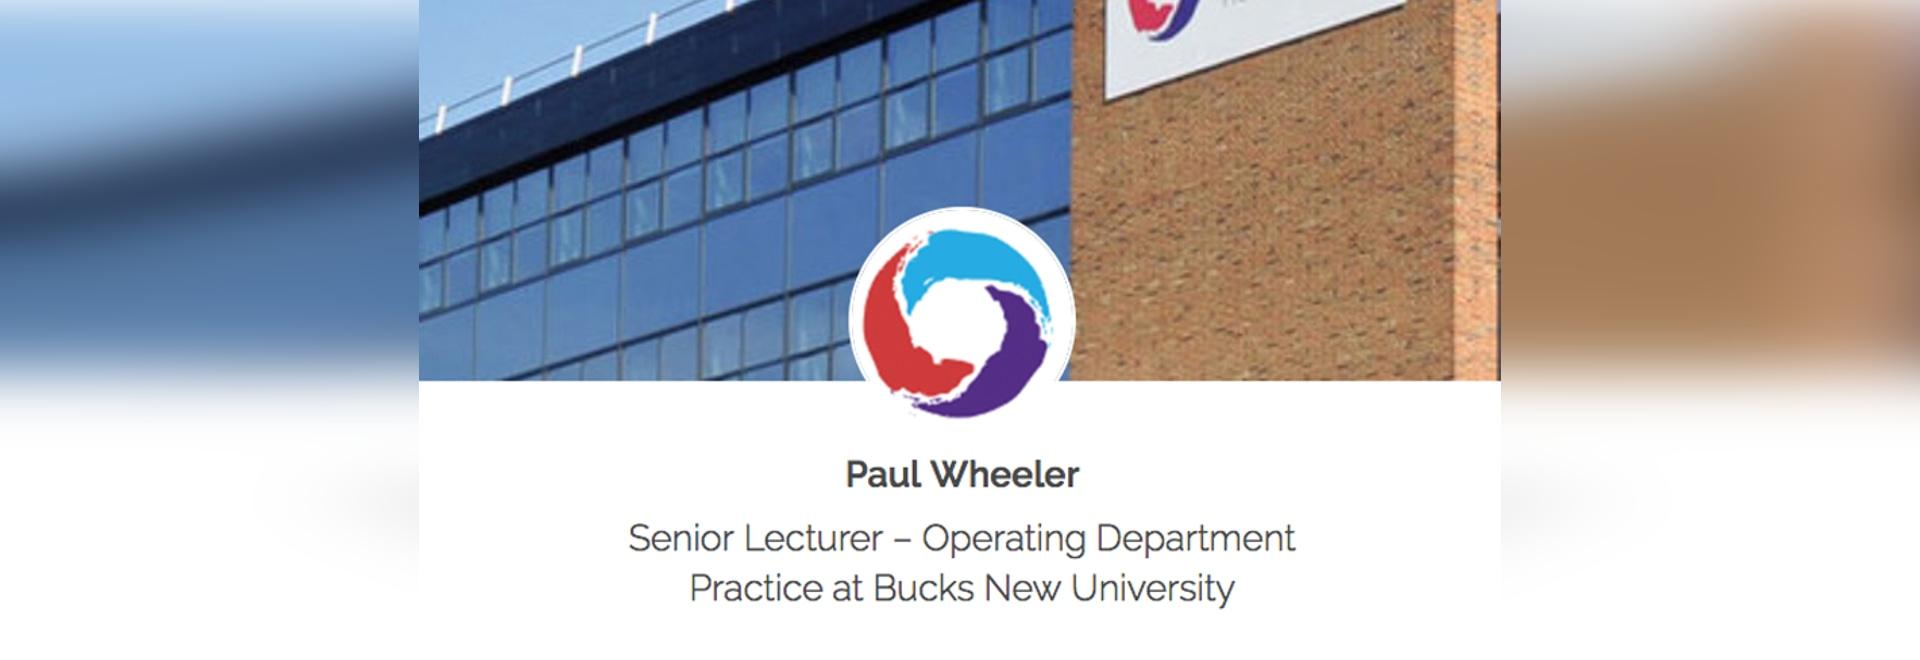 Paul Wheeler - Preparing the Next Generation of Medical Professionals with KwickScreen